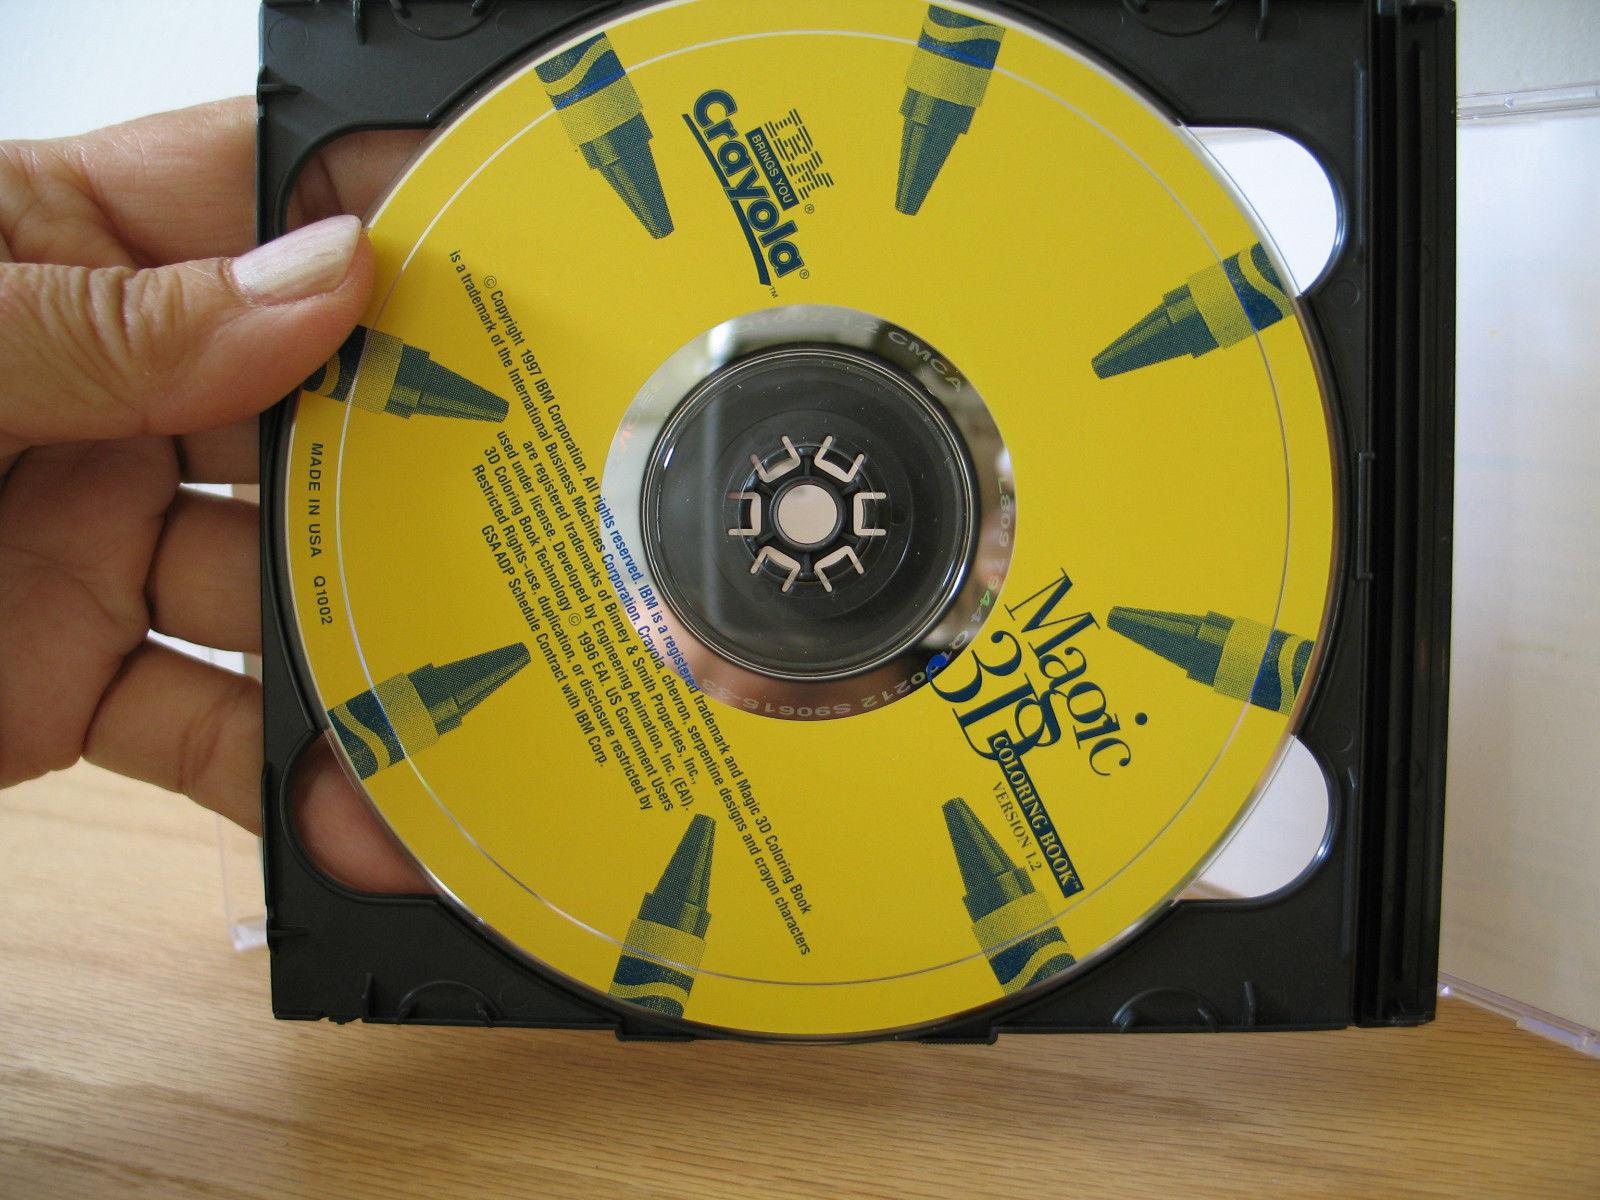 5 IBM Crayola PC/Mac CD Rom Games-Paper and 46 similar items